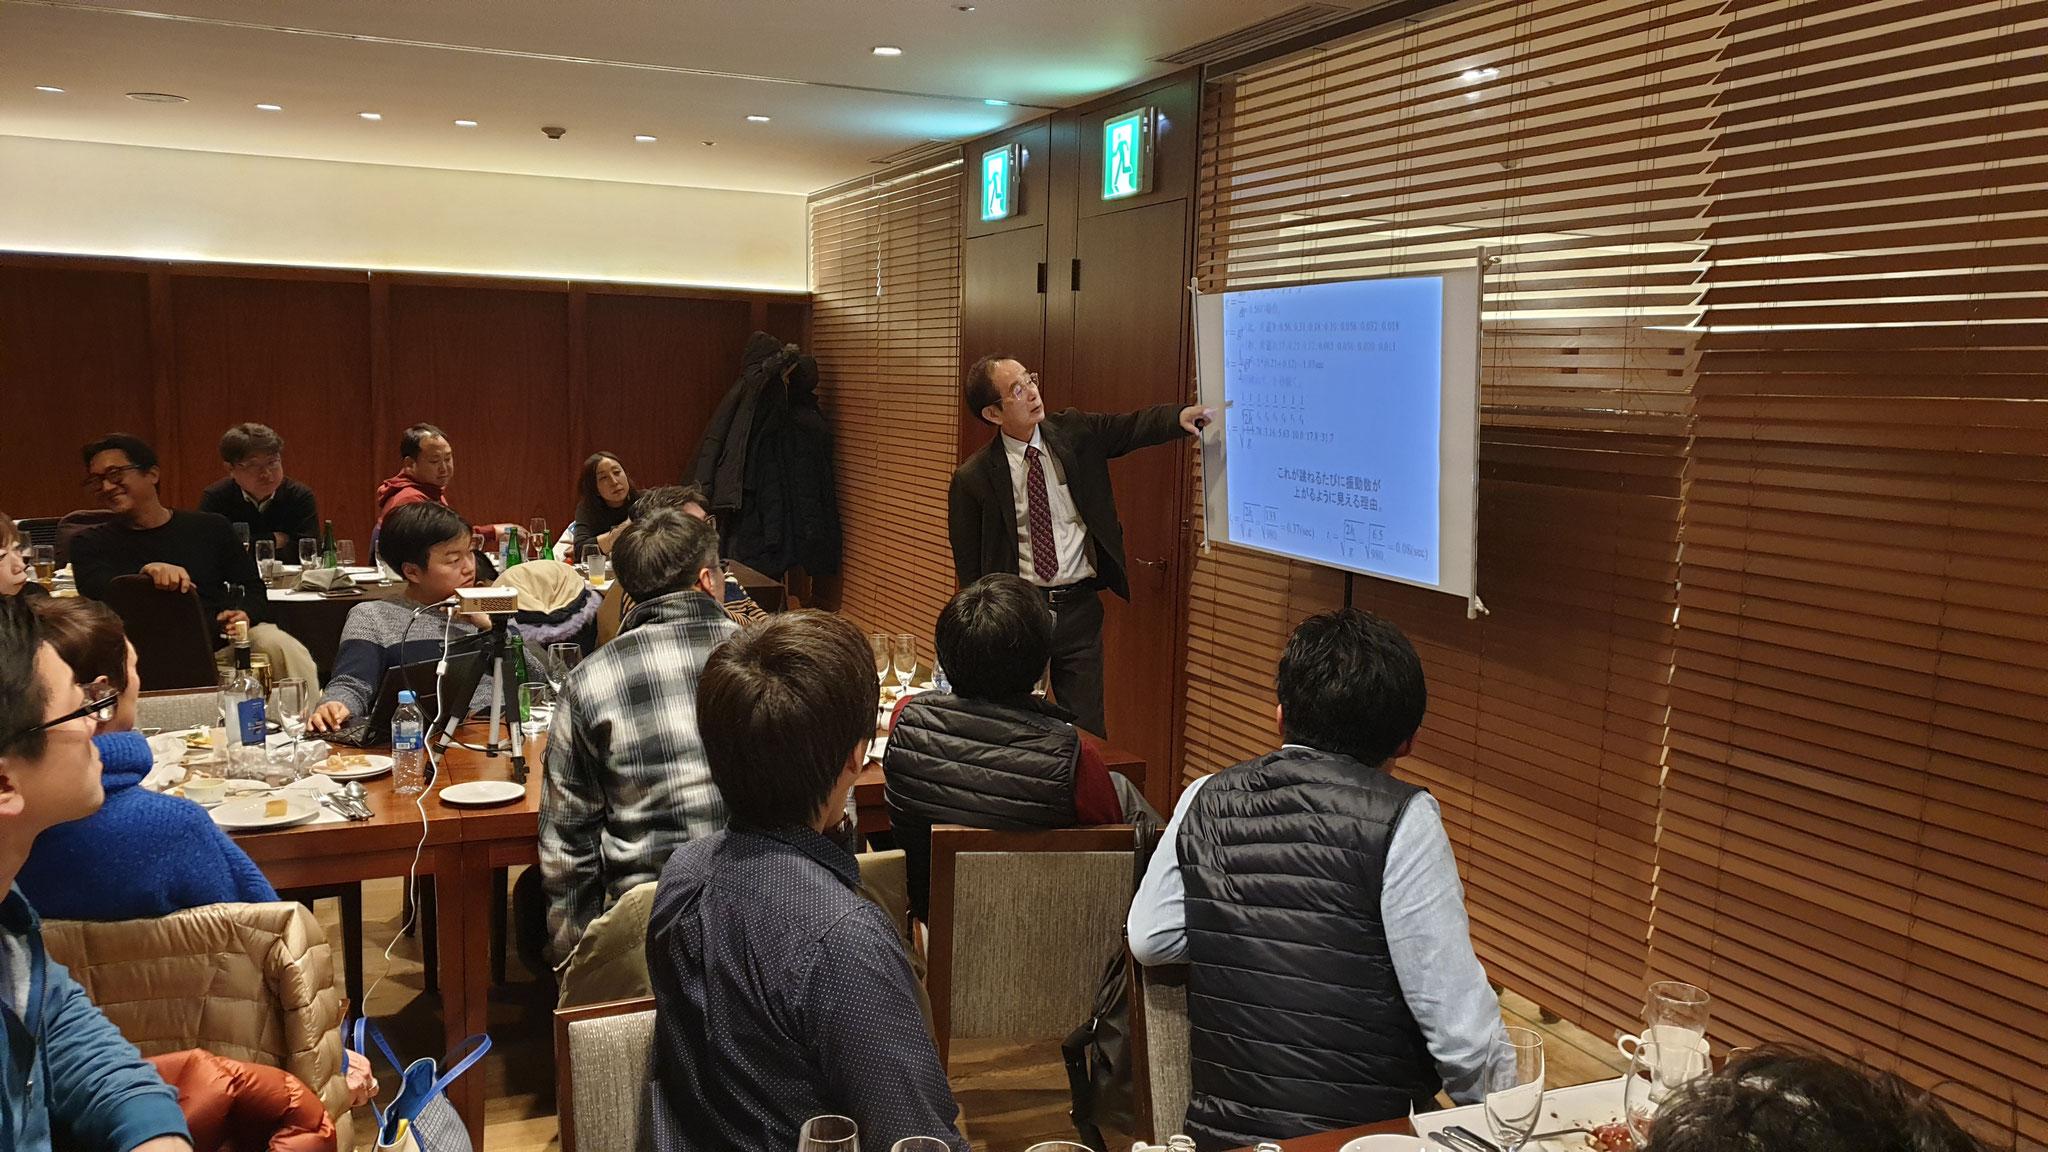 2019年1月29日(土): 村田先生の講演 @ ローン総会・新年会